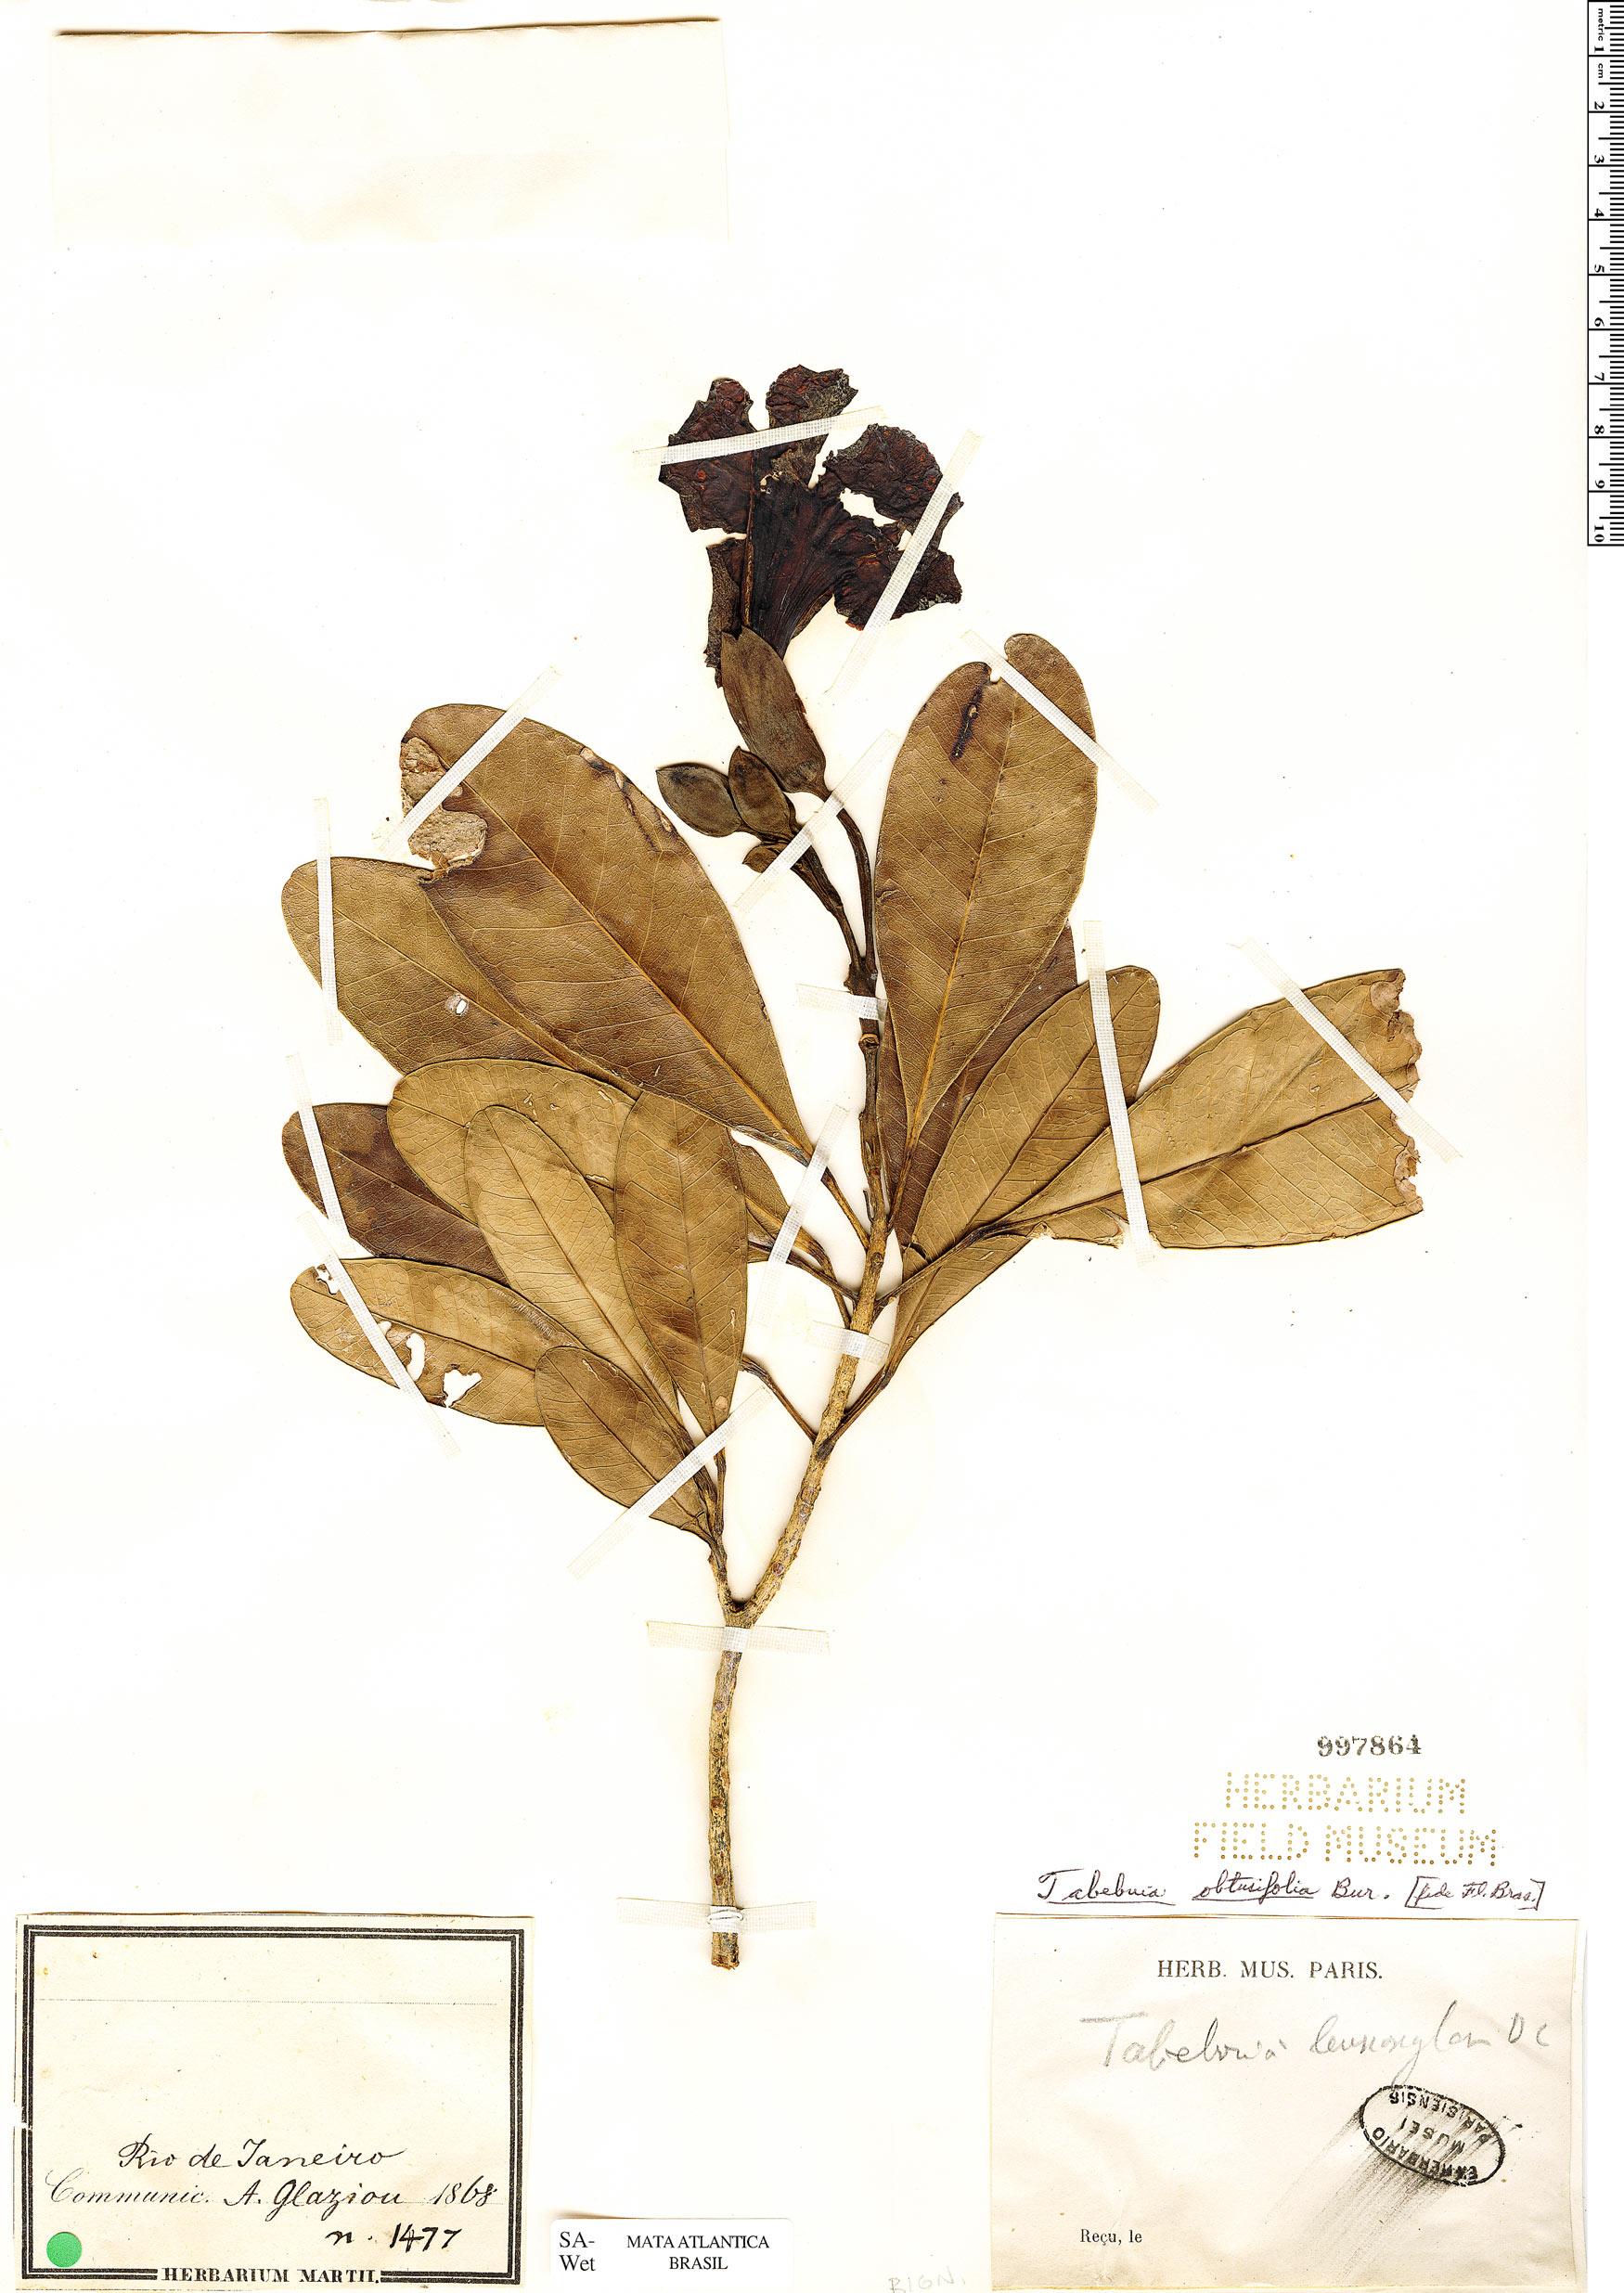 Specimen: Tabebuia obtusifolia